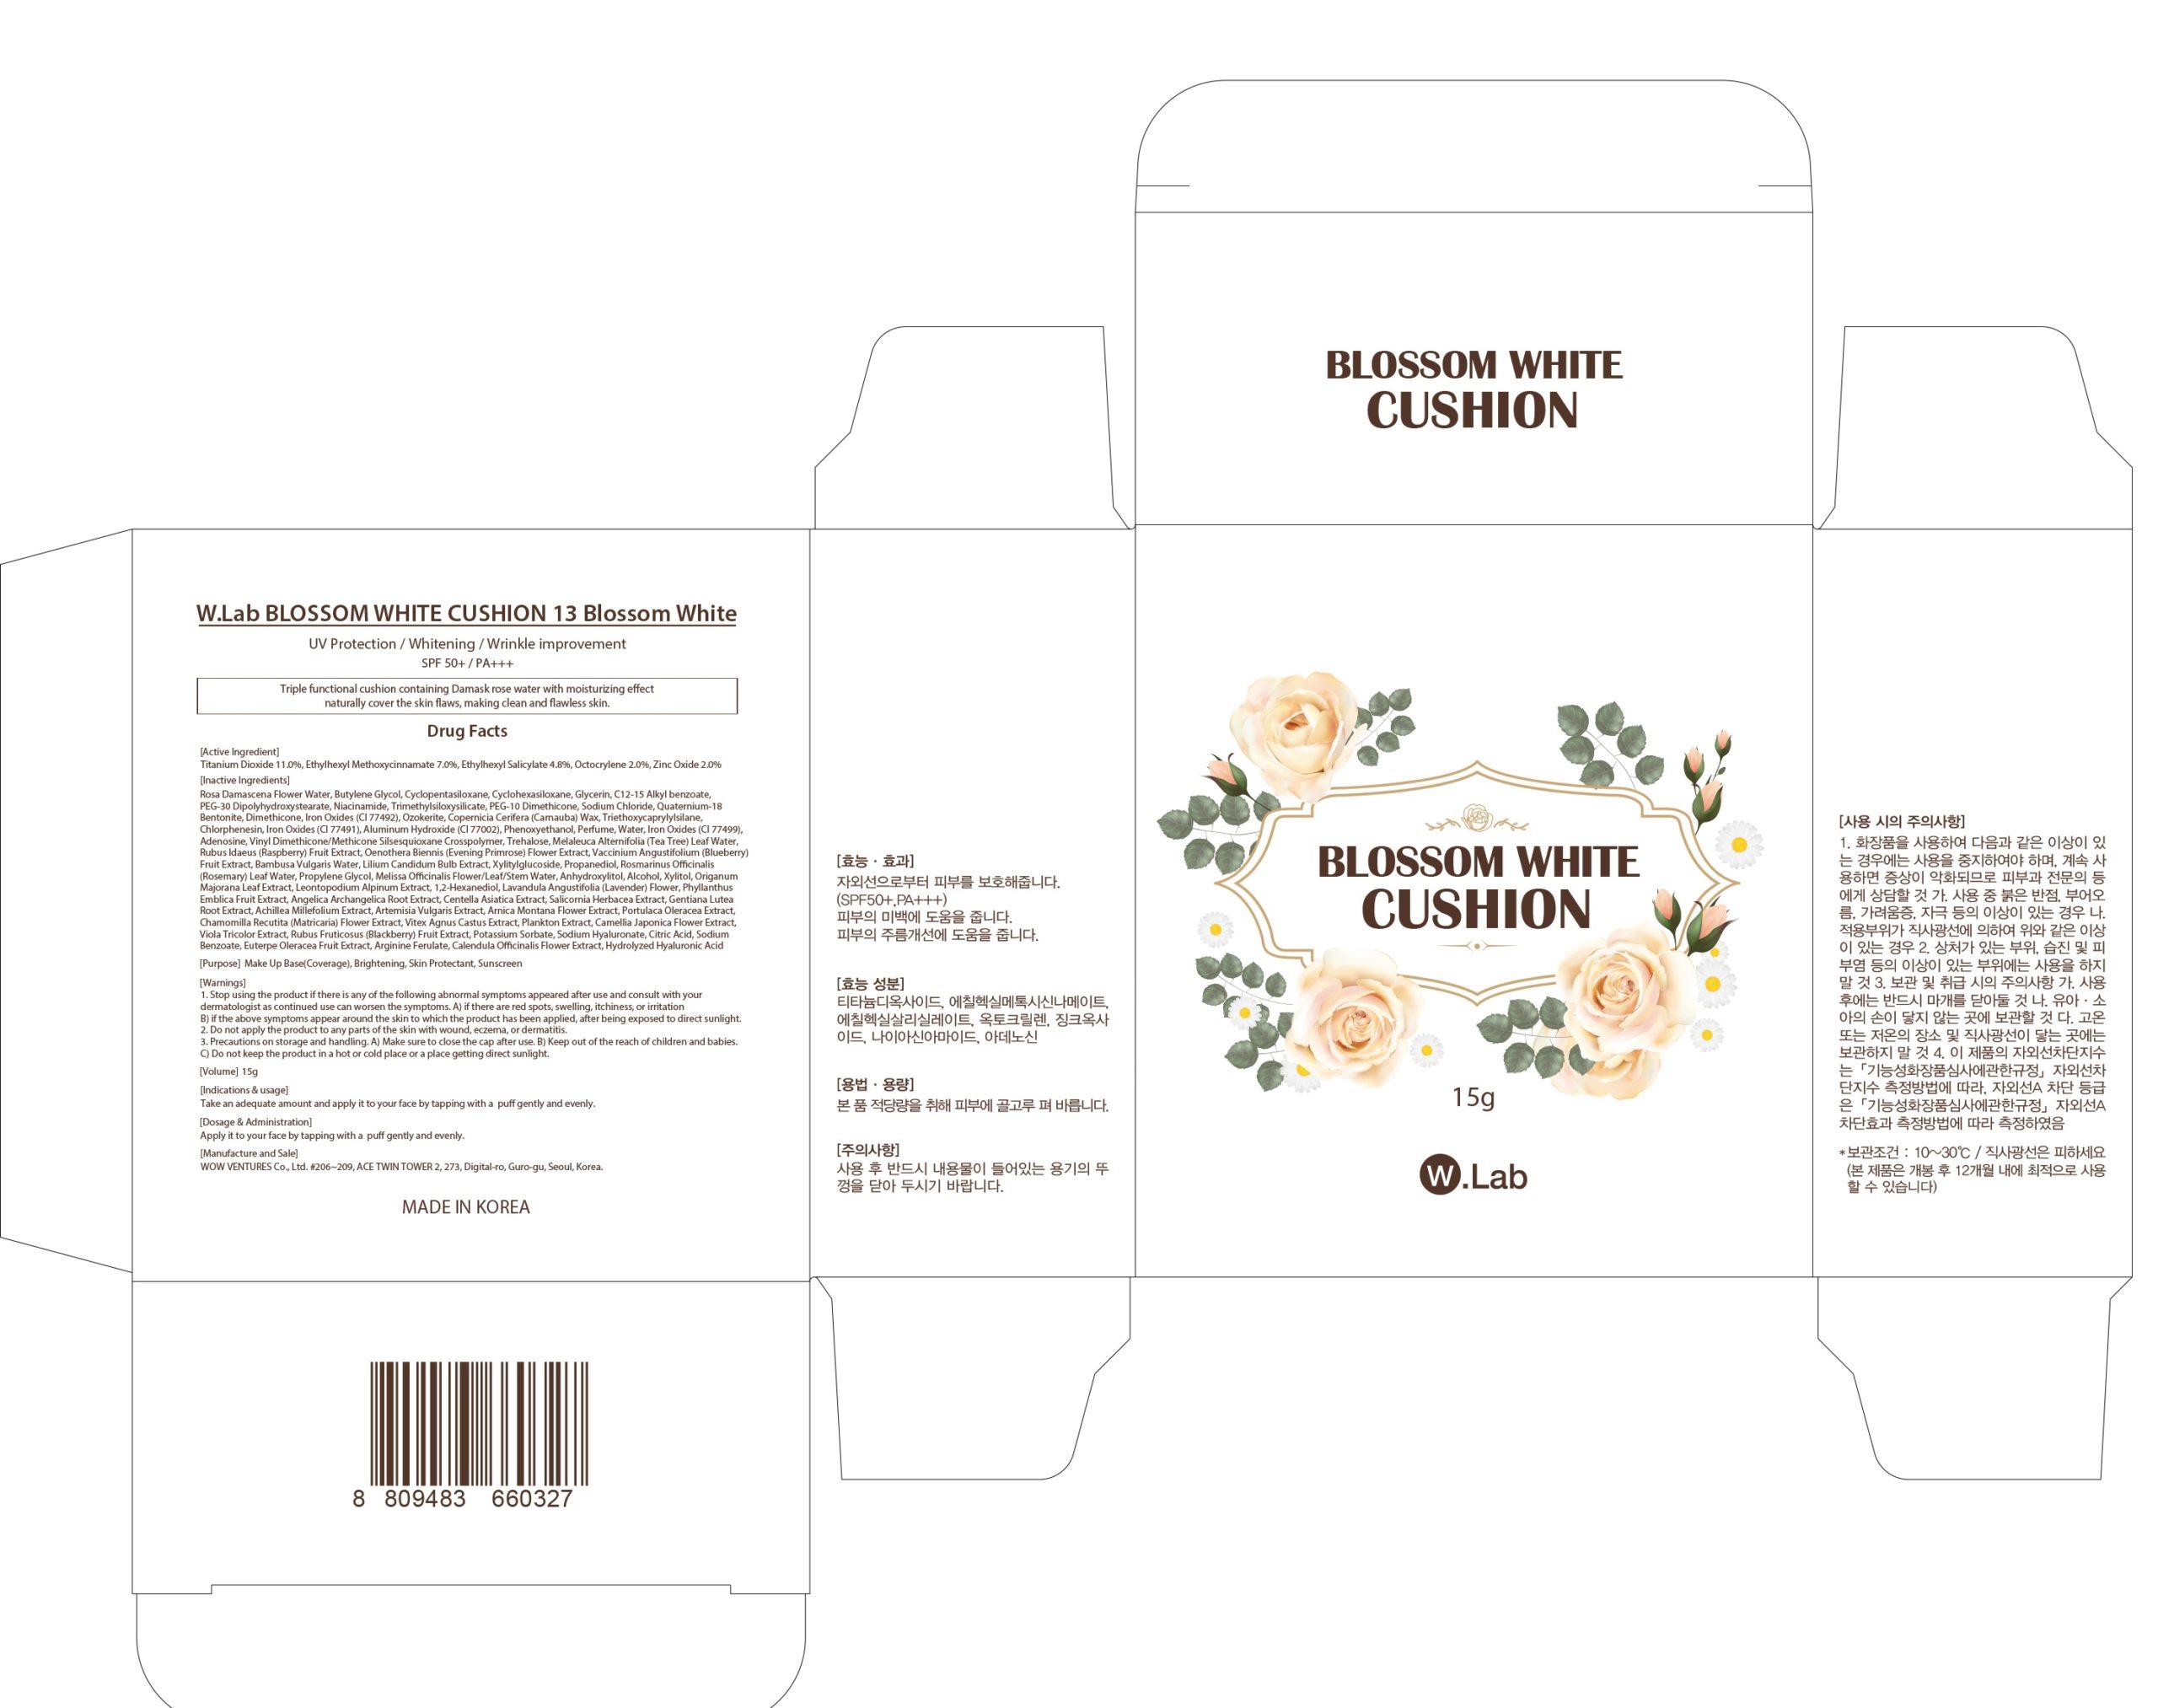 Titanium Dioxide, Octinoxate, Octisalate, Octocrylene, Zinc Oxide (W Lab BLOSSOM WHITE CUSHION 13 Blossom White)